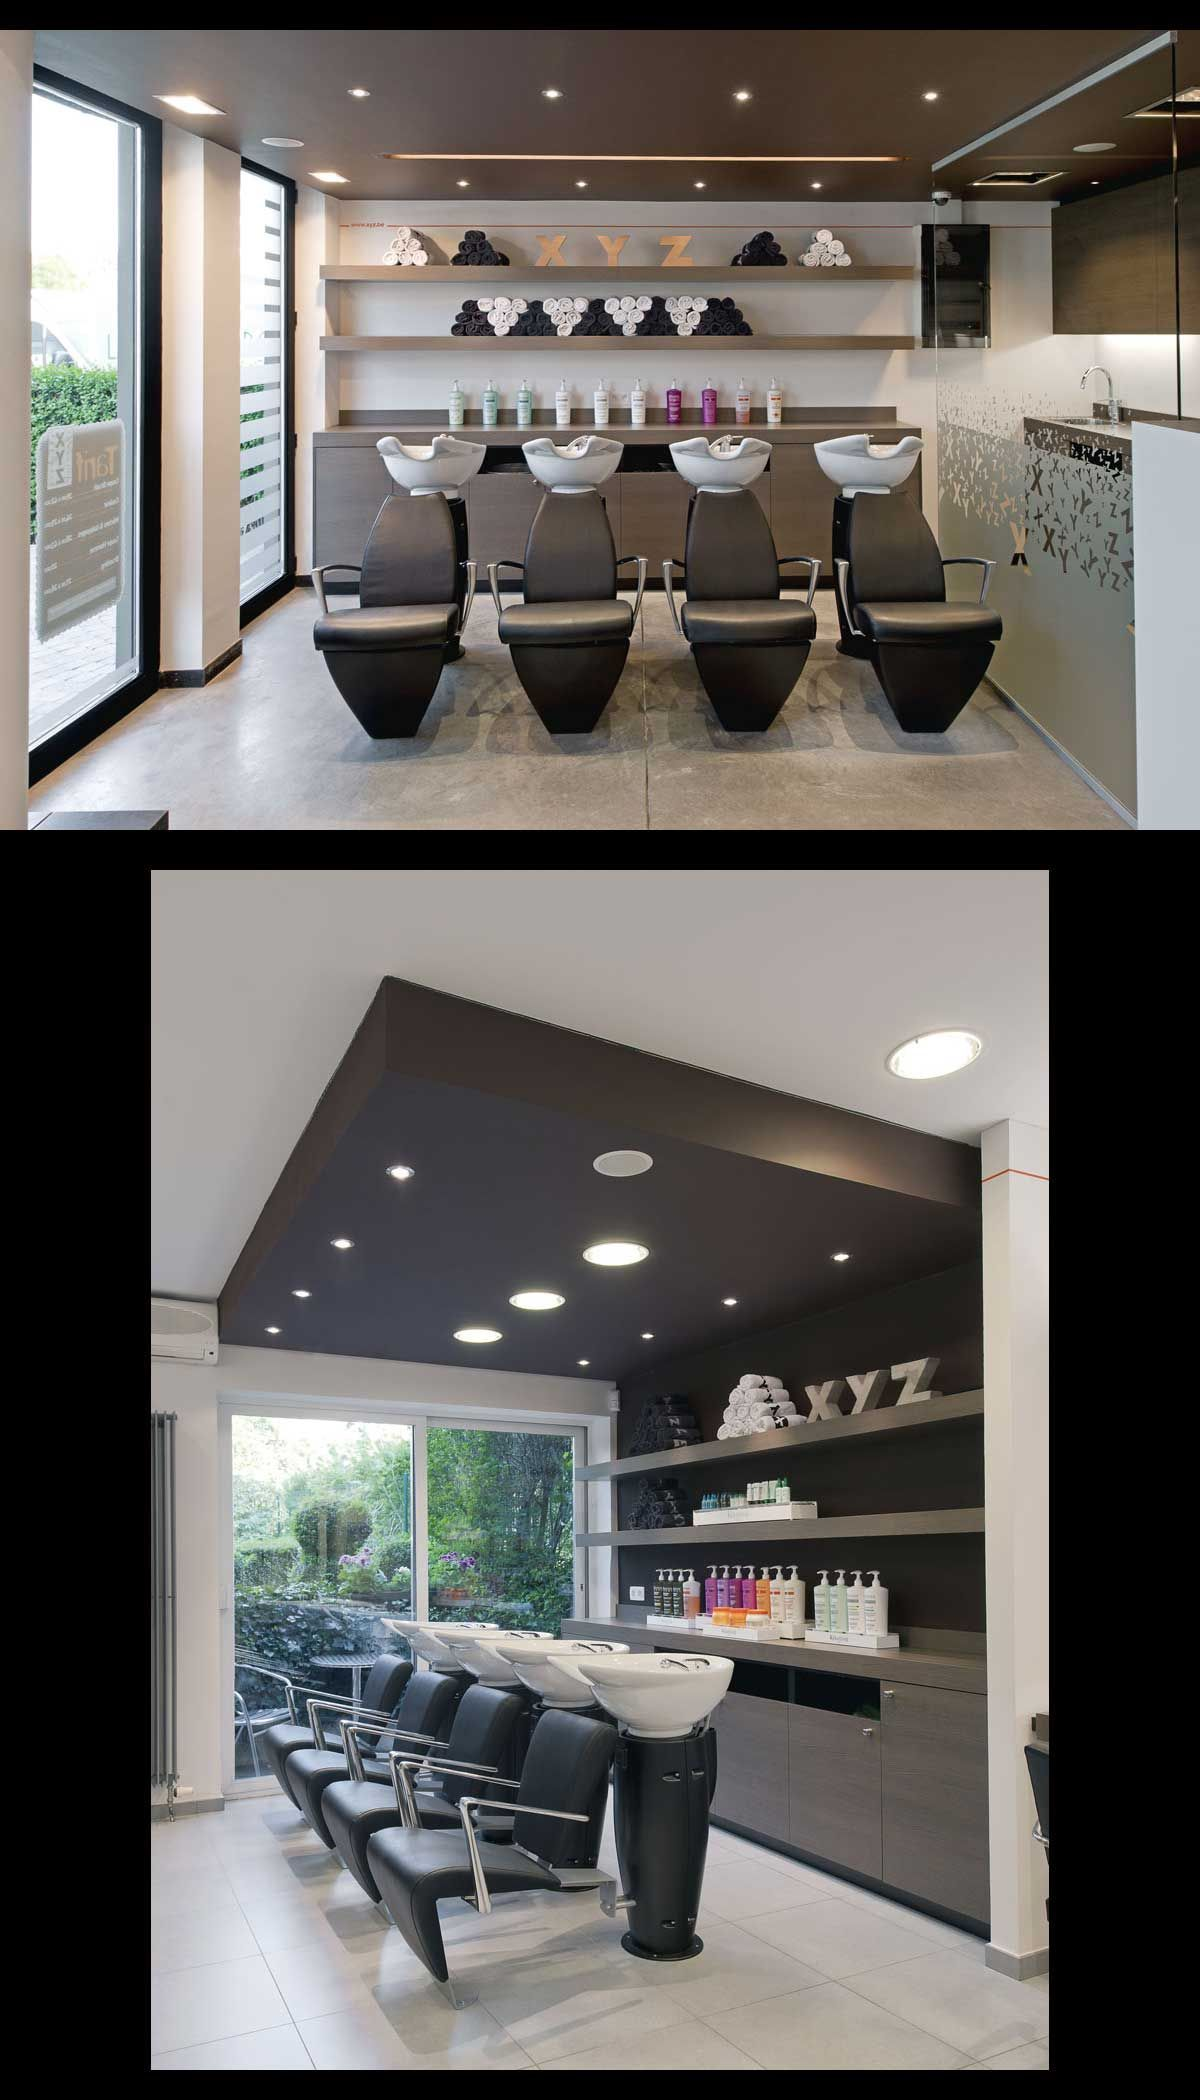 15 Ideas For A Stylish Beauty Salon Decoratoo Salon Interior Design Salon Interior Salon Design